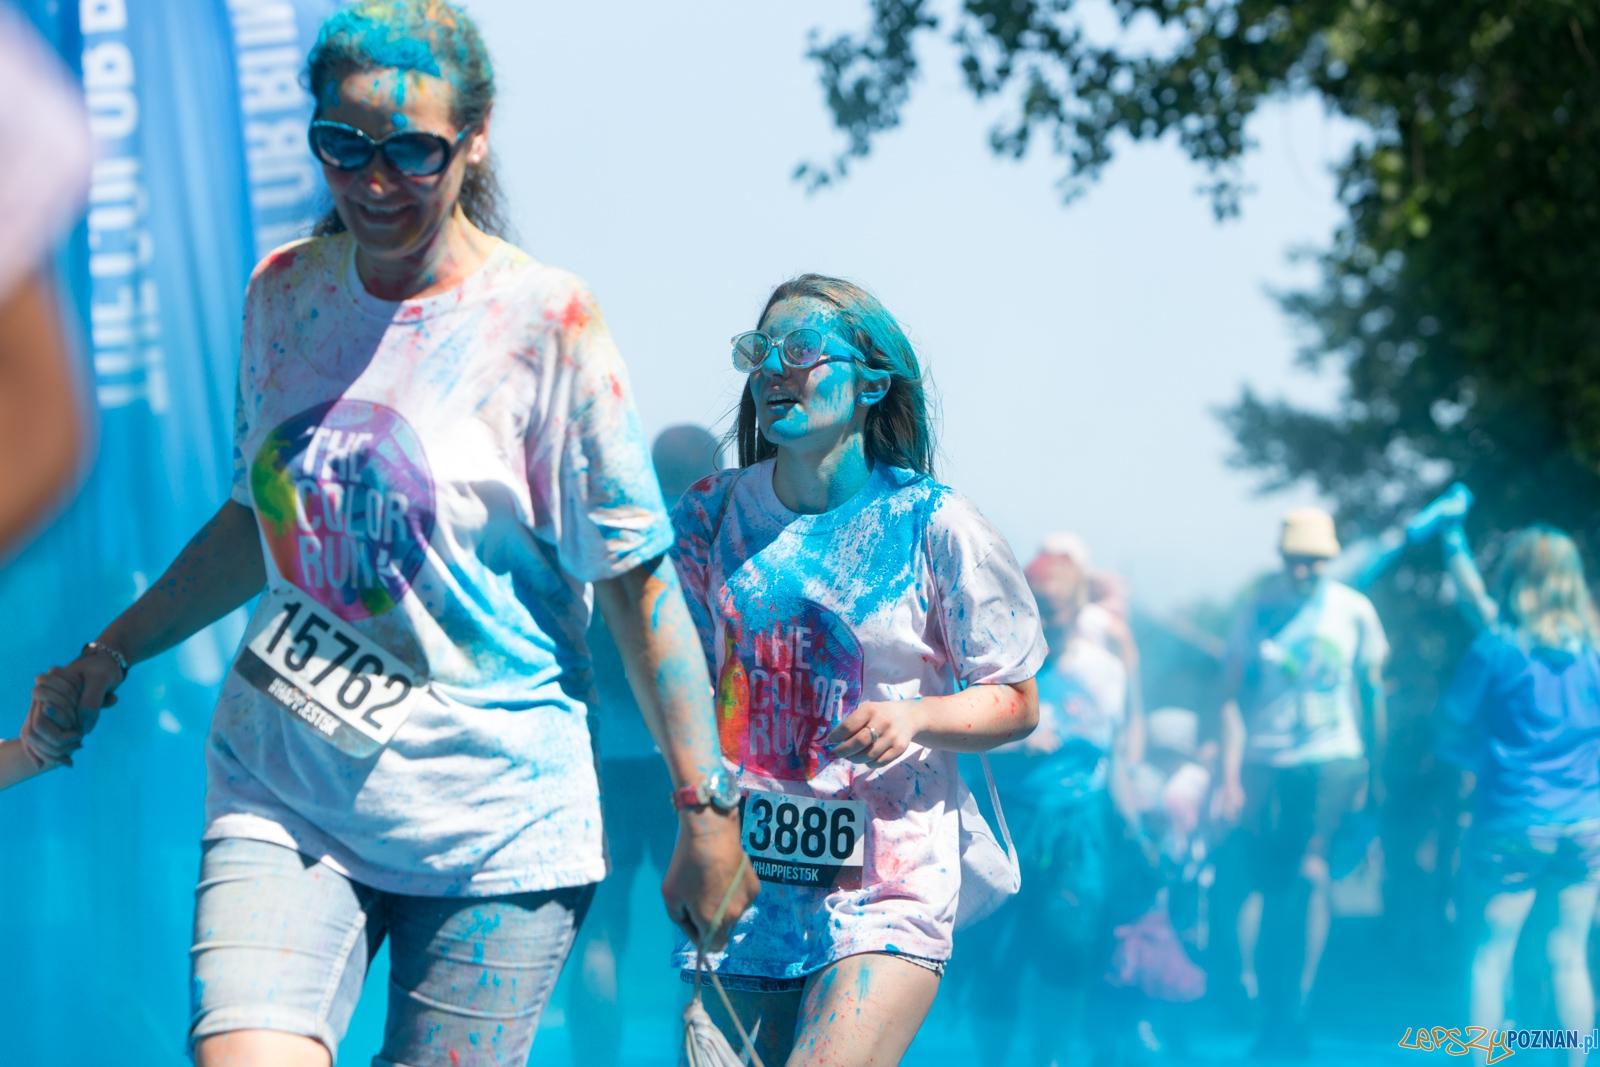 The Colour Run  Foto: lepszyPOZNAN.pl / Piotr Rychter